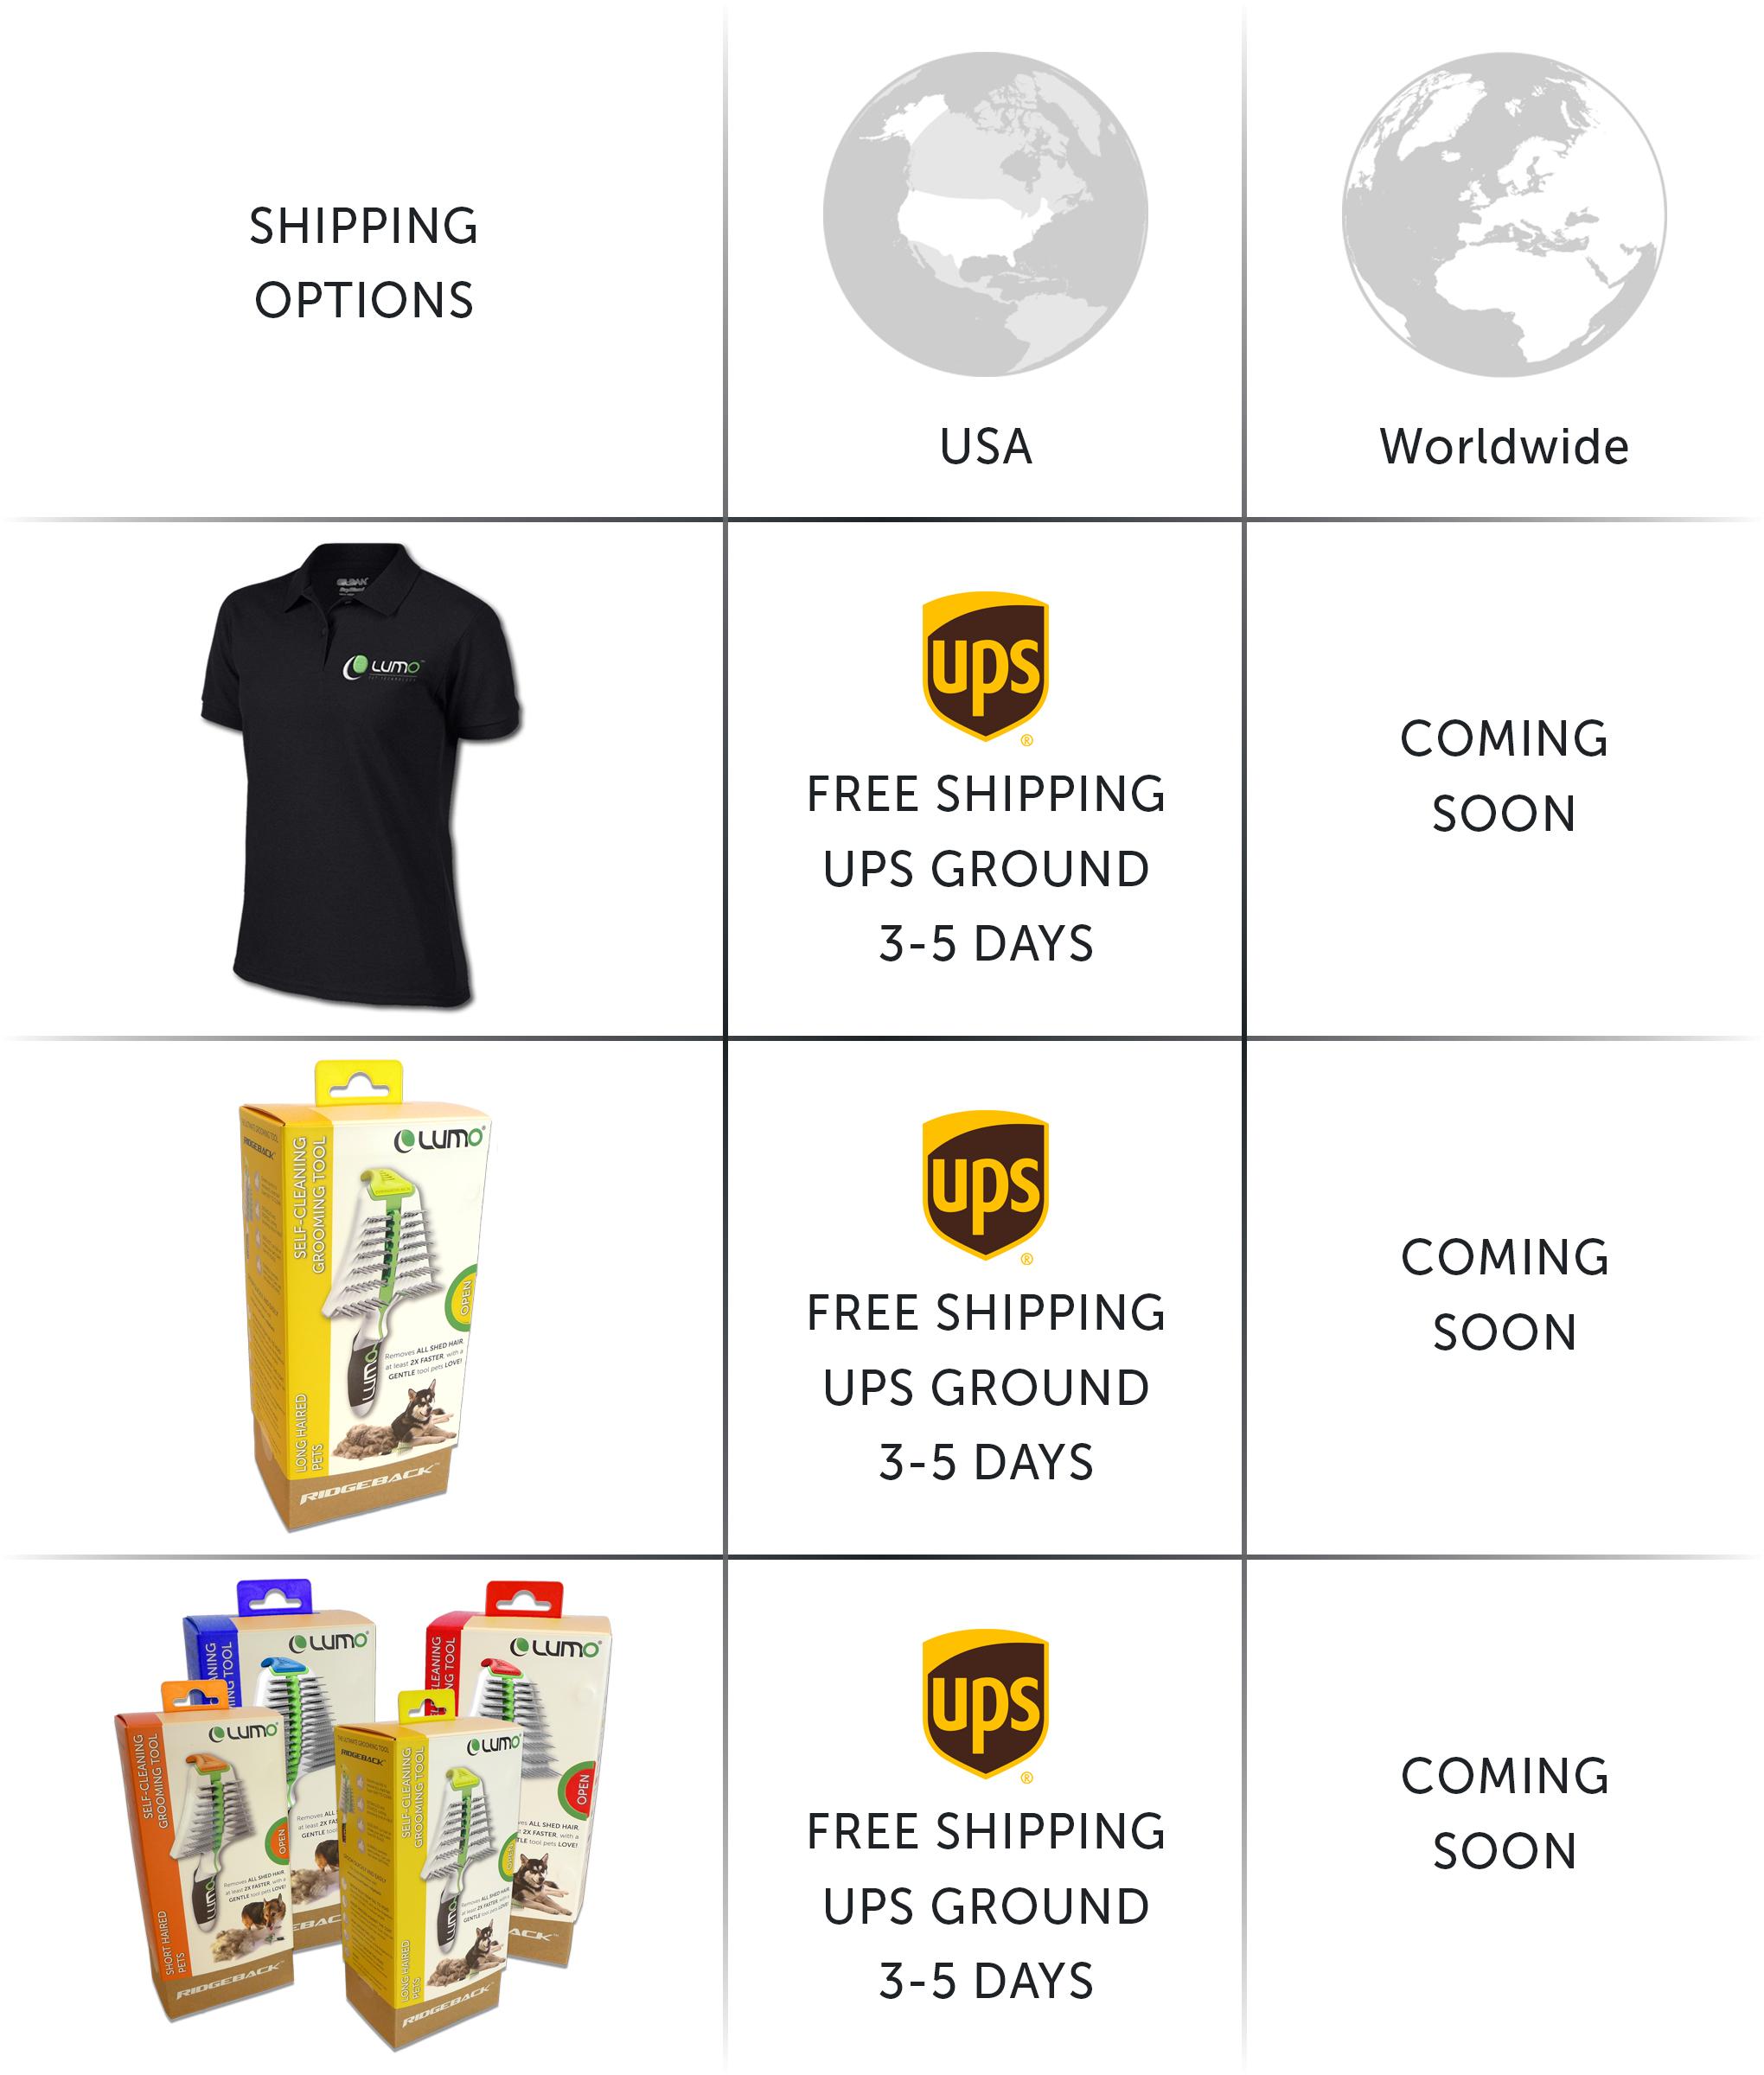 Shipping-Image-2.jpg